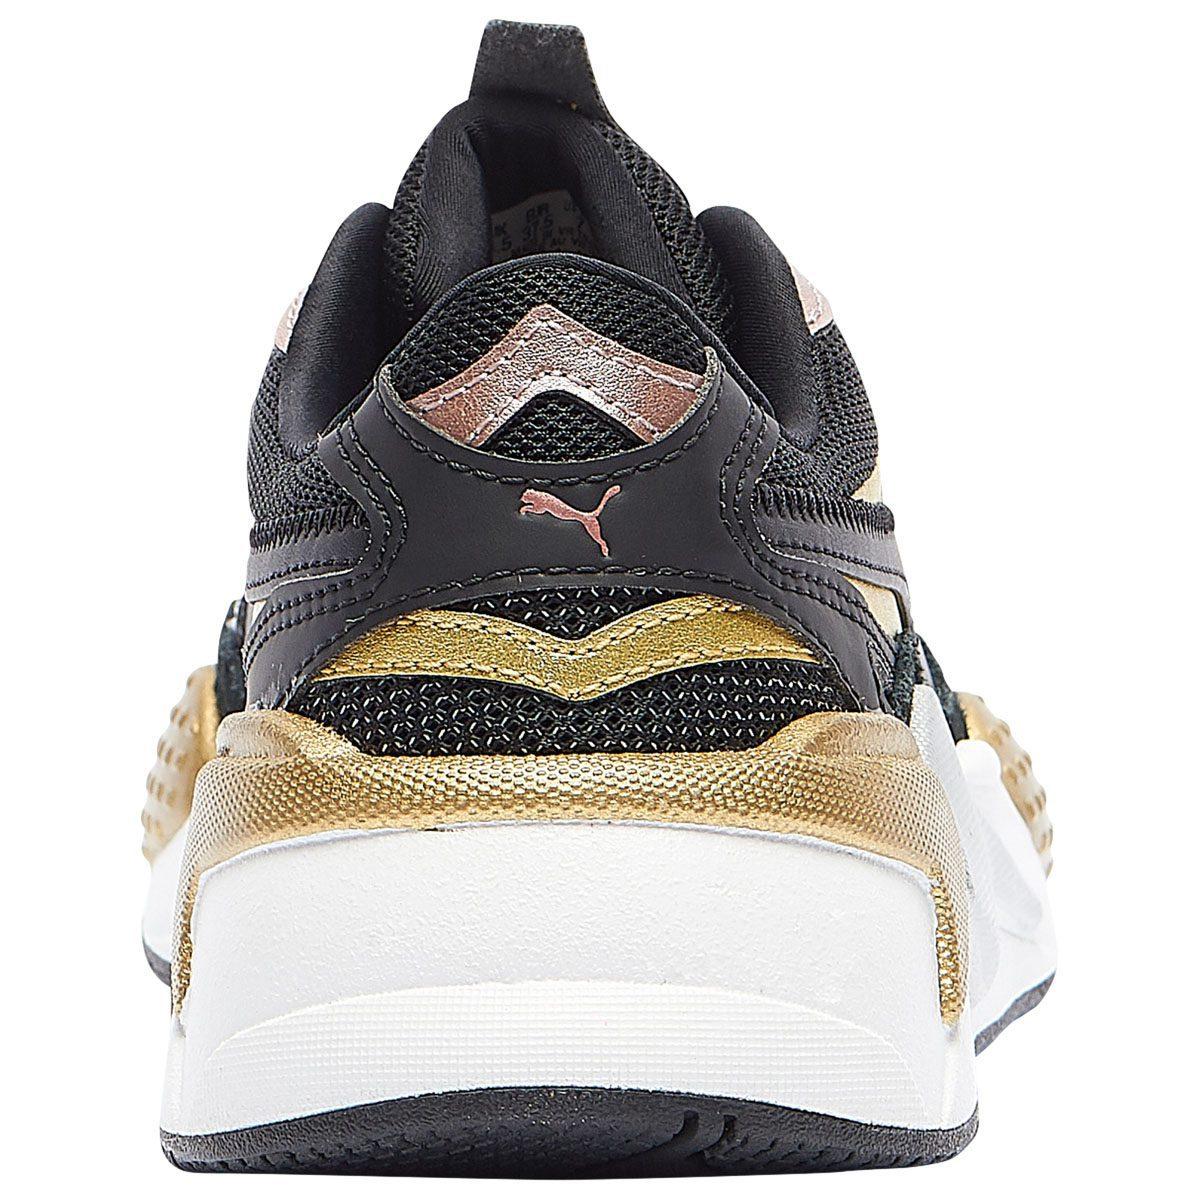 Puma Women S Rs X3 Metallic Puma Black Puma Silver Rose Gold Sneakers 37432901 Wooki Com